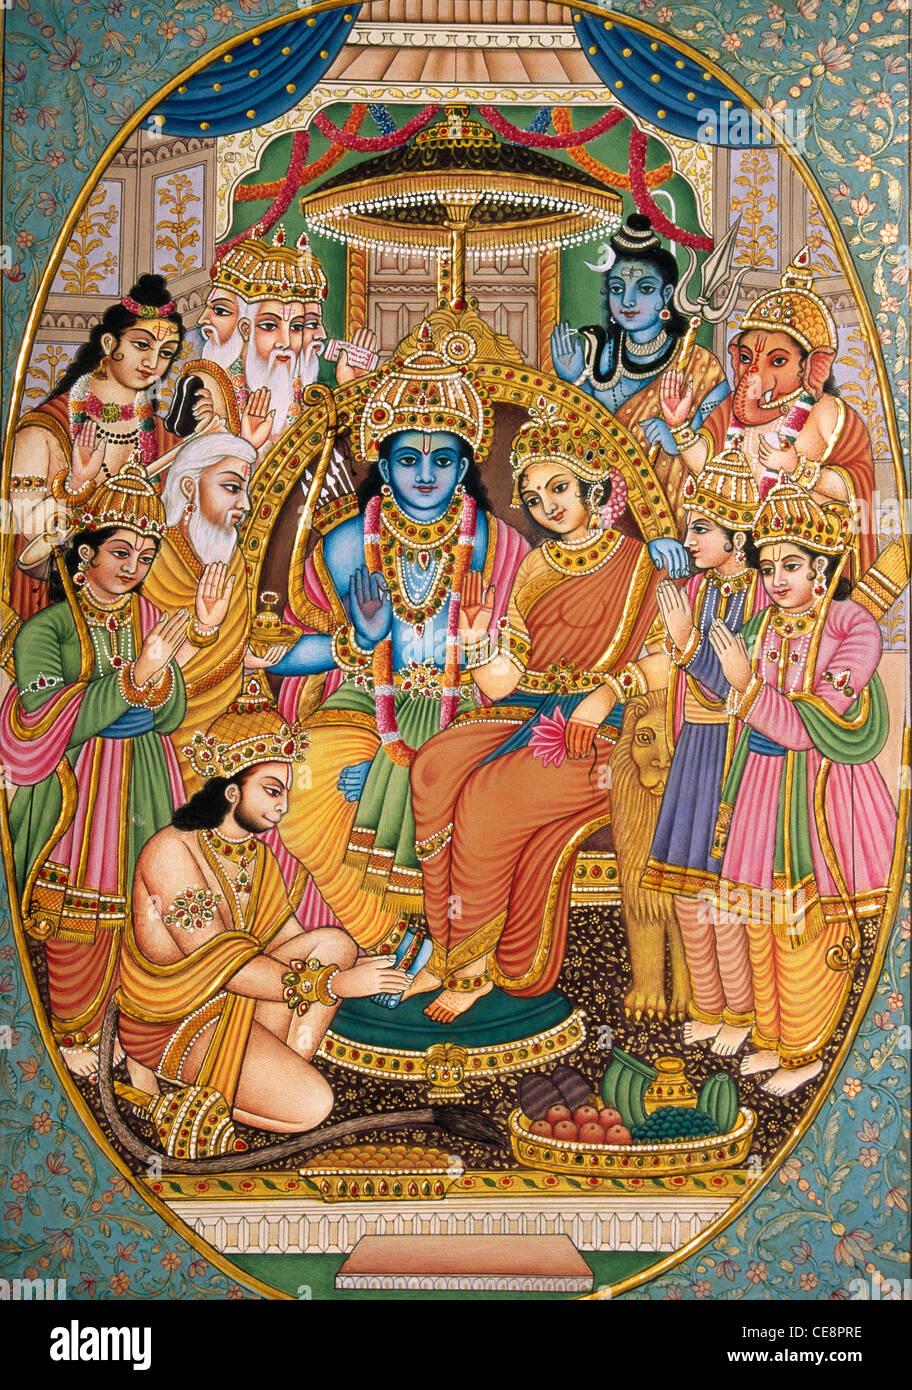 Popular Wallpaper Lord Ram Darbar - ram-darbar-with-gods-shiva-parwati-ganesh-brahma-hanuman-sita-lakshman-CE8PRE  Snapshot_32457.jpg